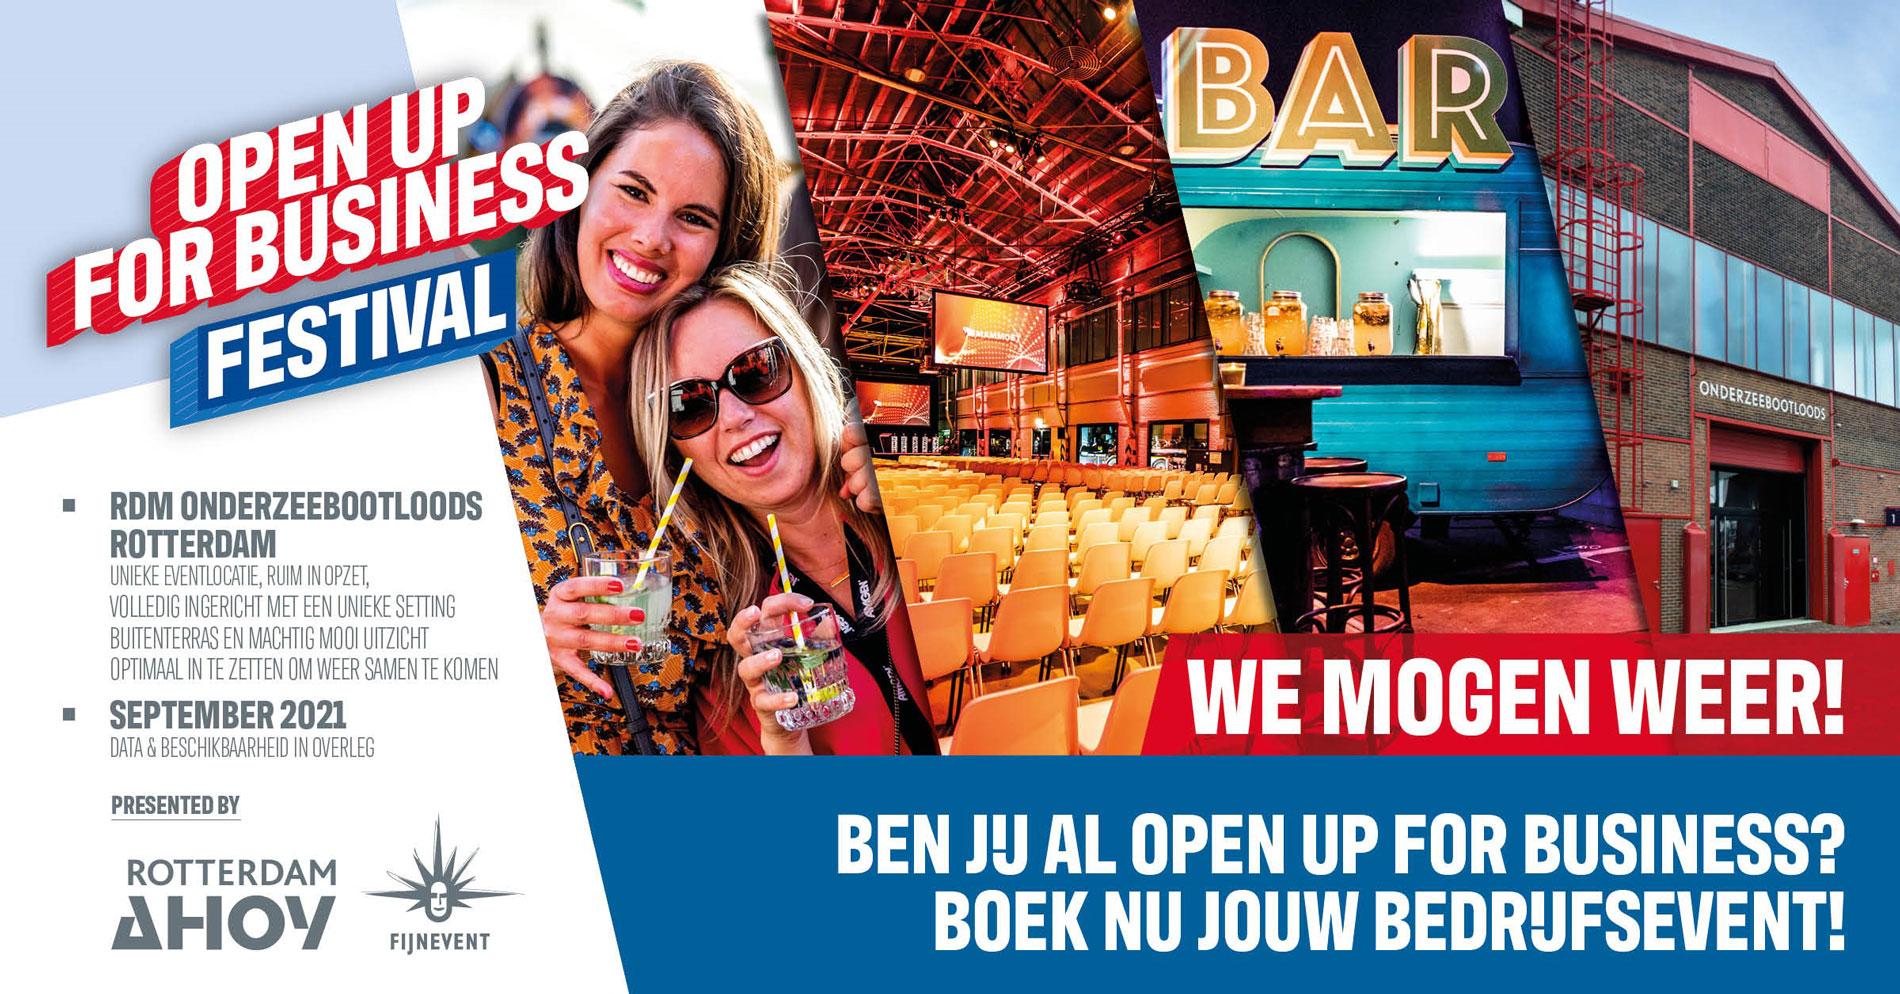 Open up for business festival informatie